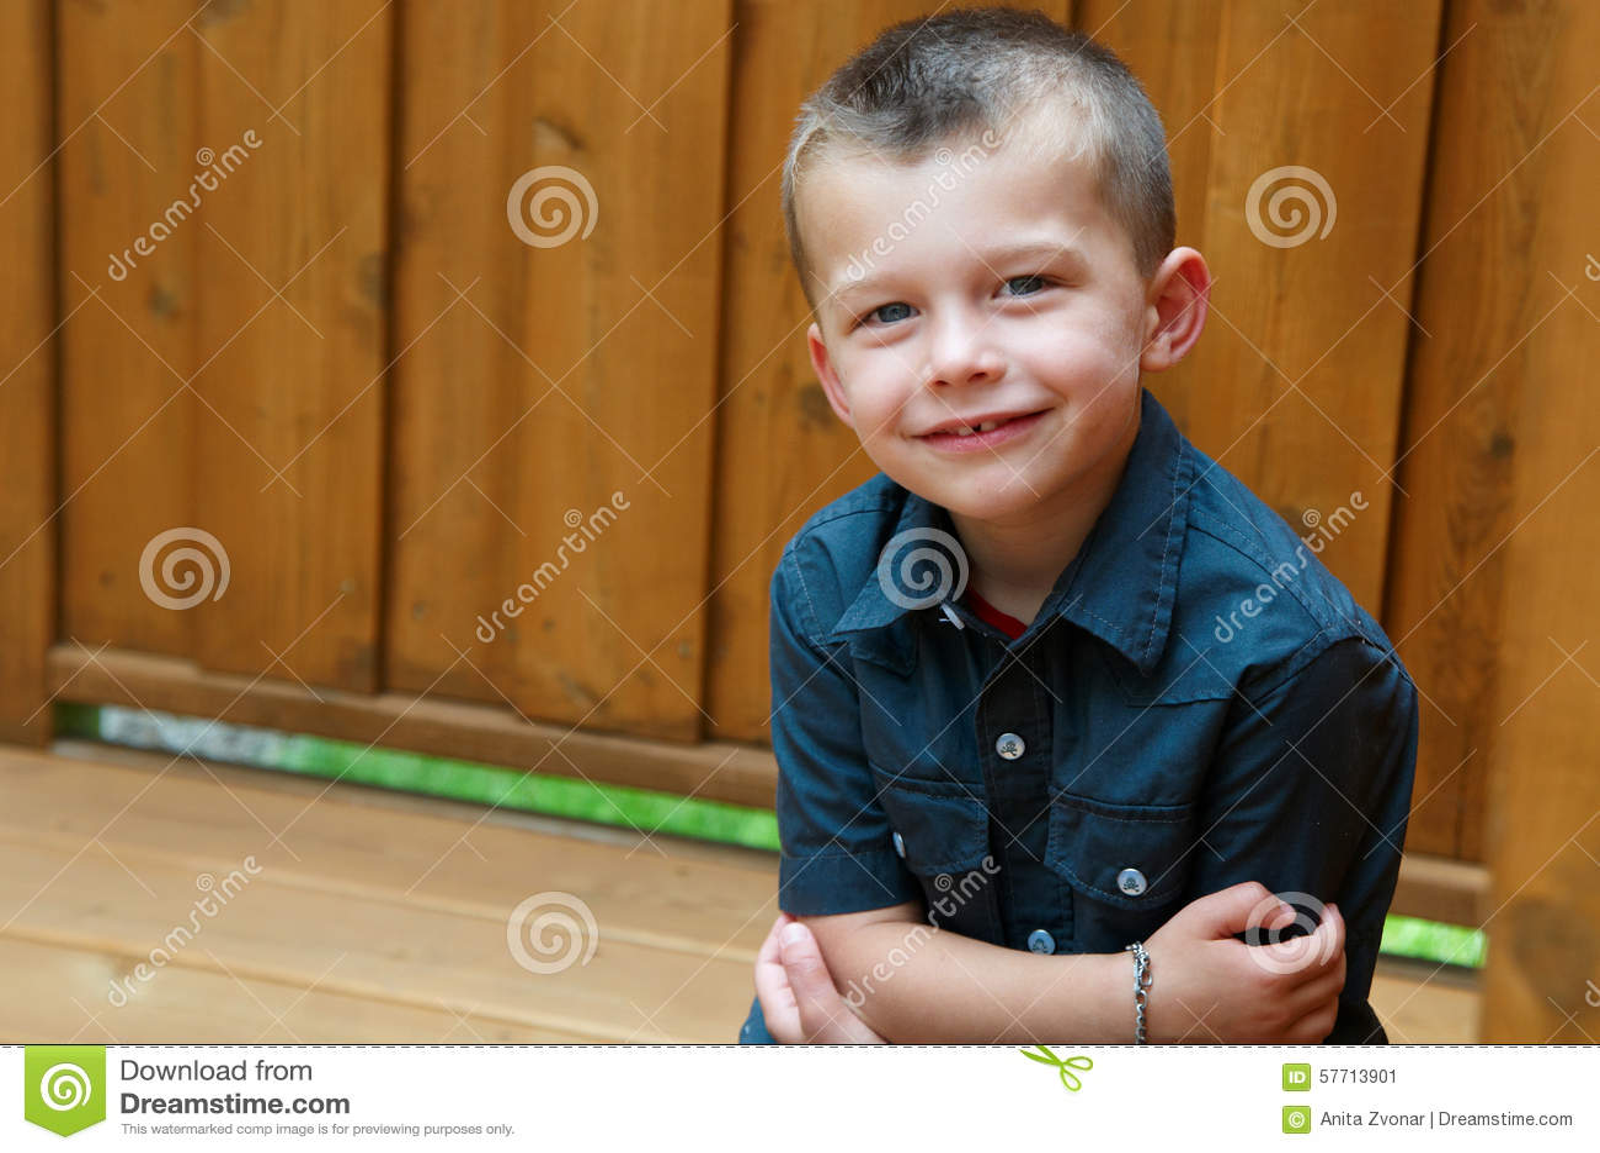 5 Year Old Boy Portrait Stock Photo Image 57713901